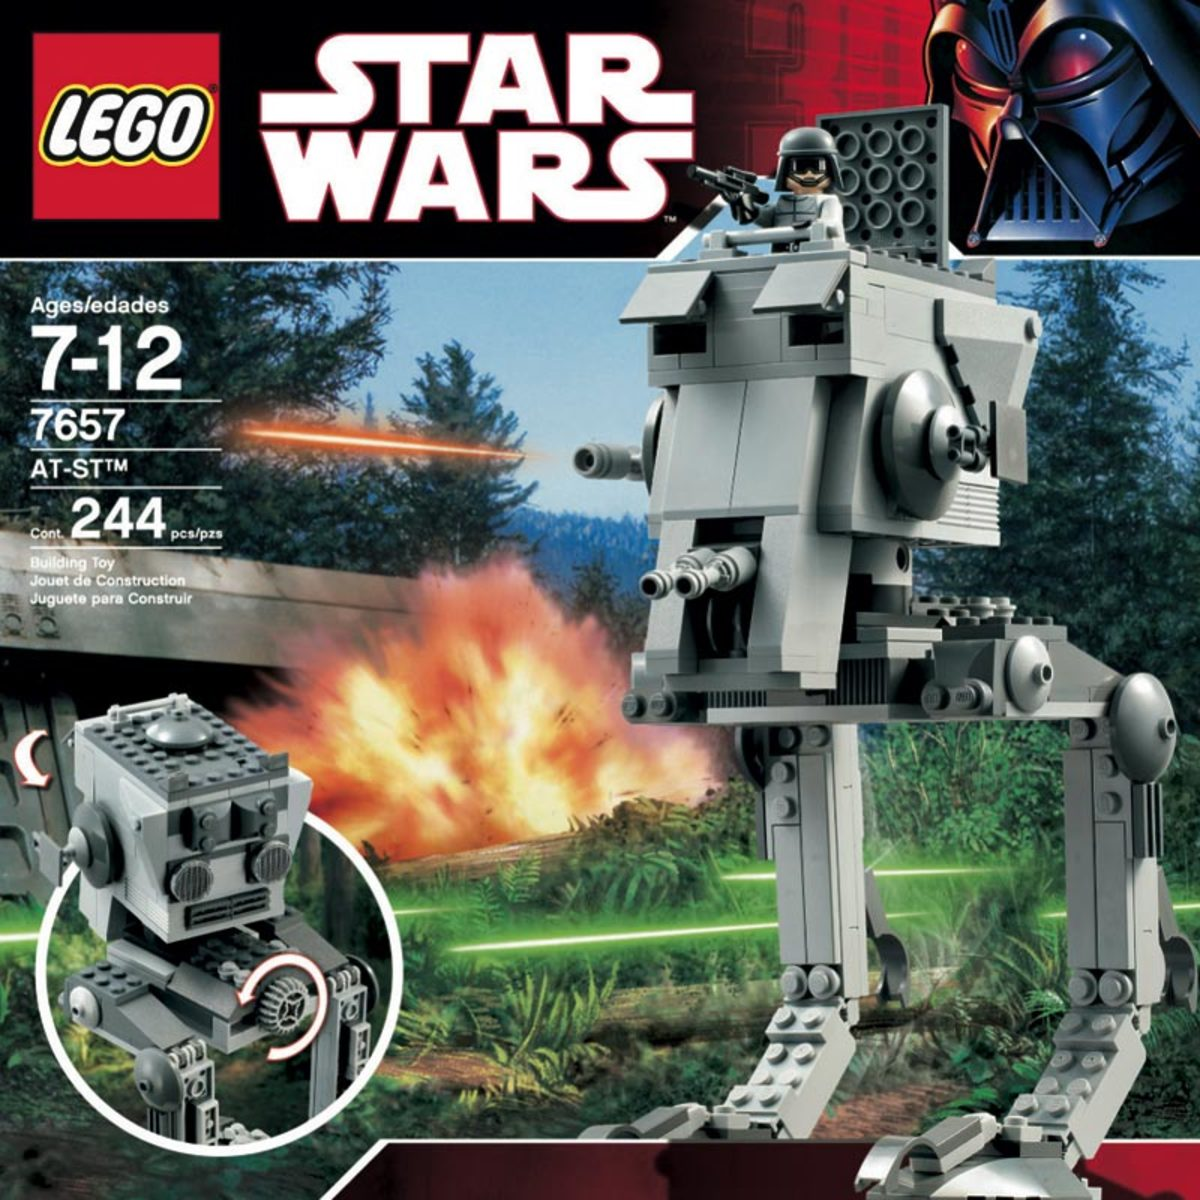 LEGO Star Wars AT-ST 7657 Box